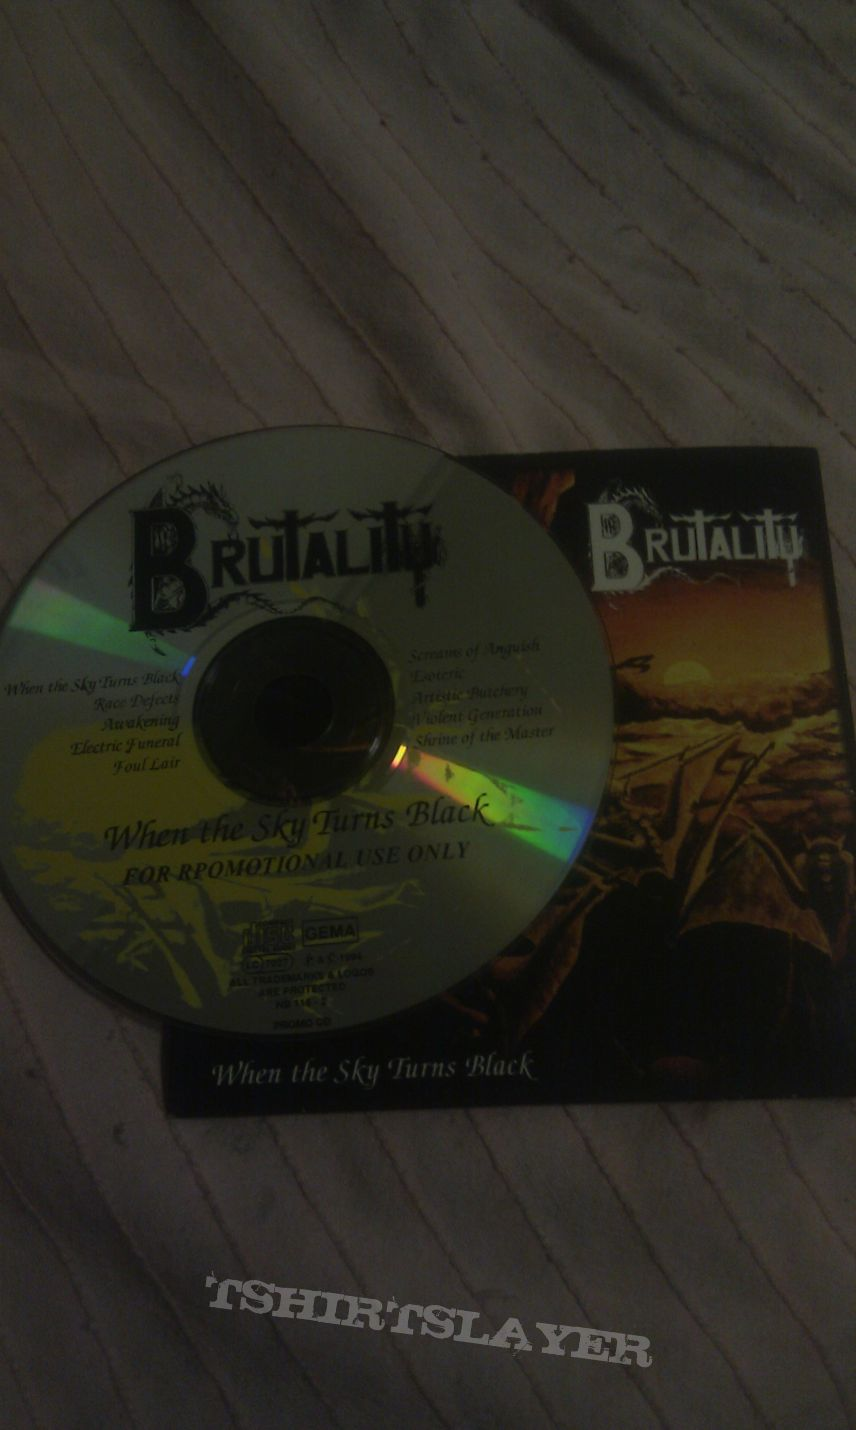 Brutality promotional  CD